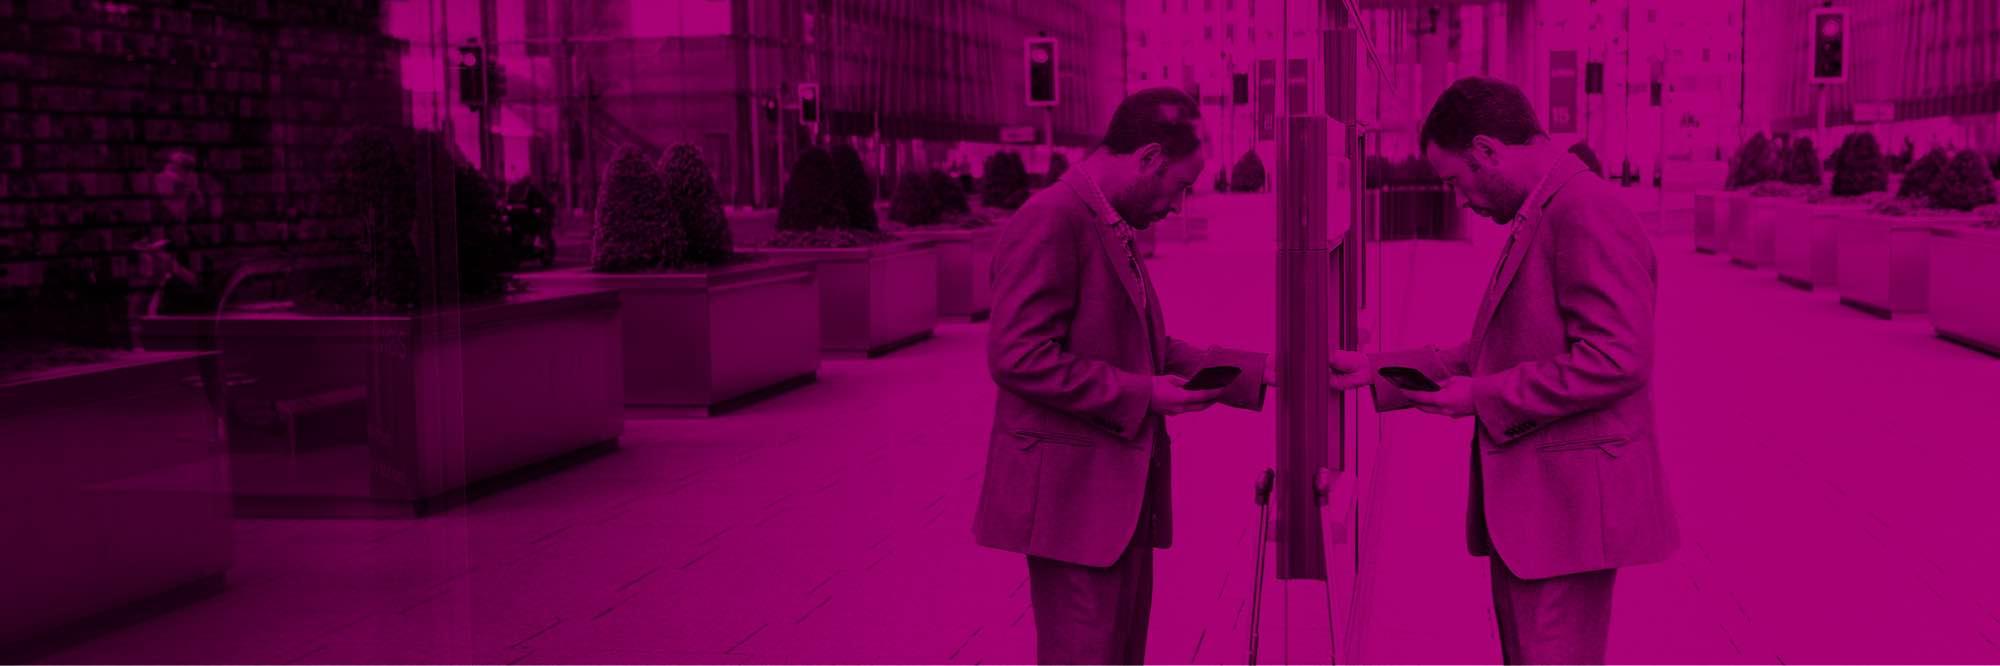 Man on city sidewalk using ATM machine